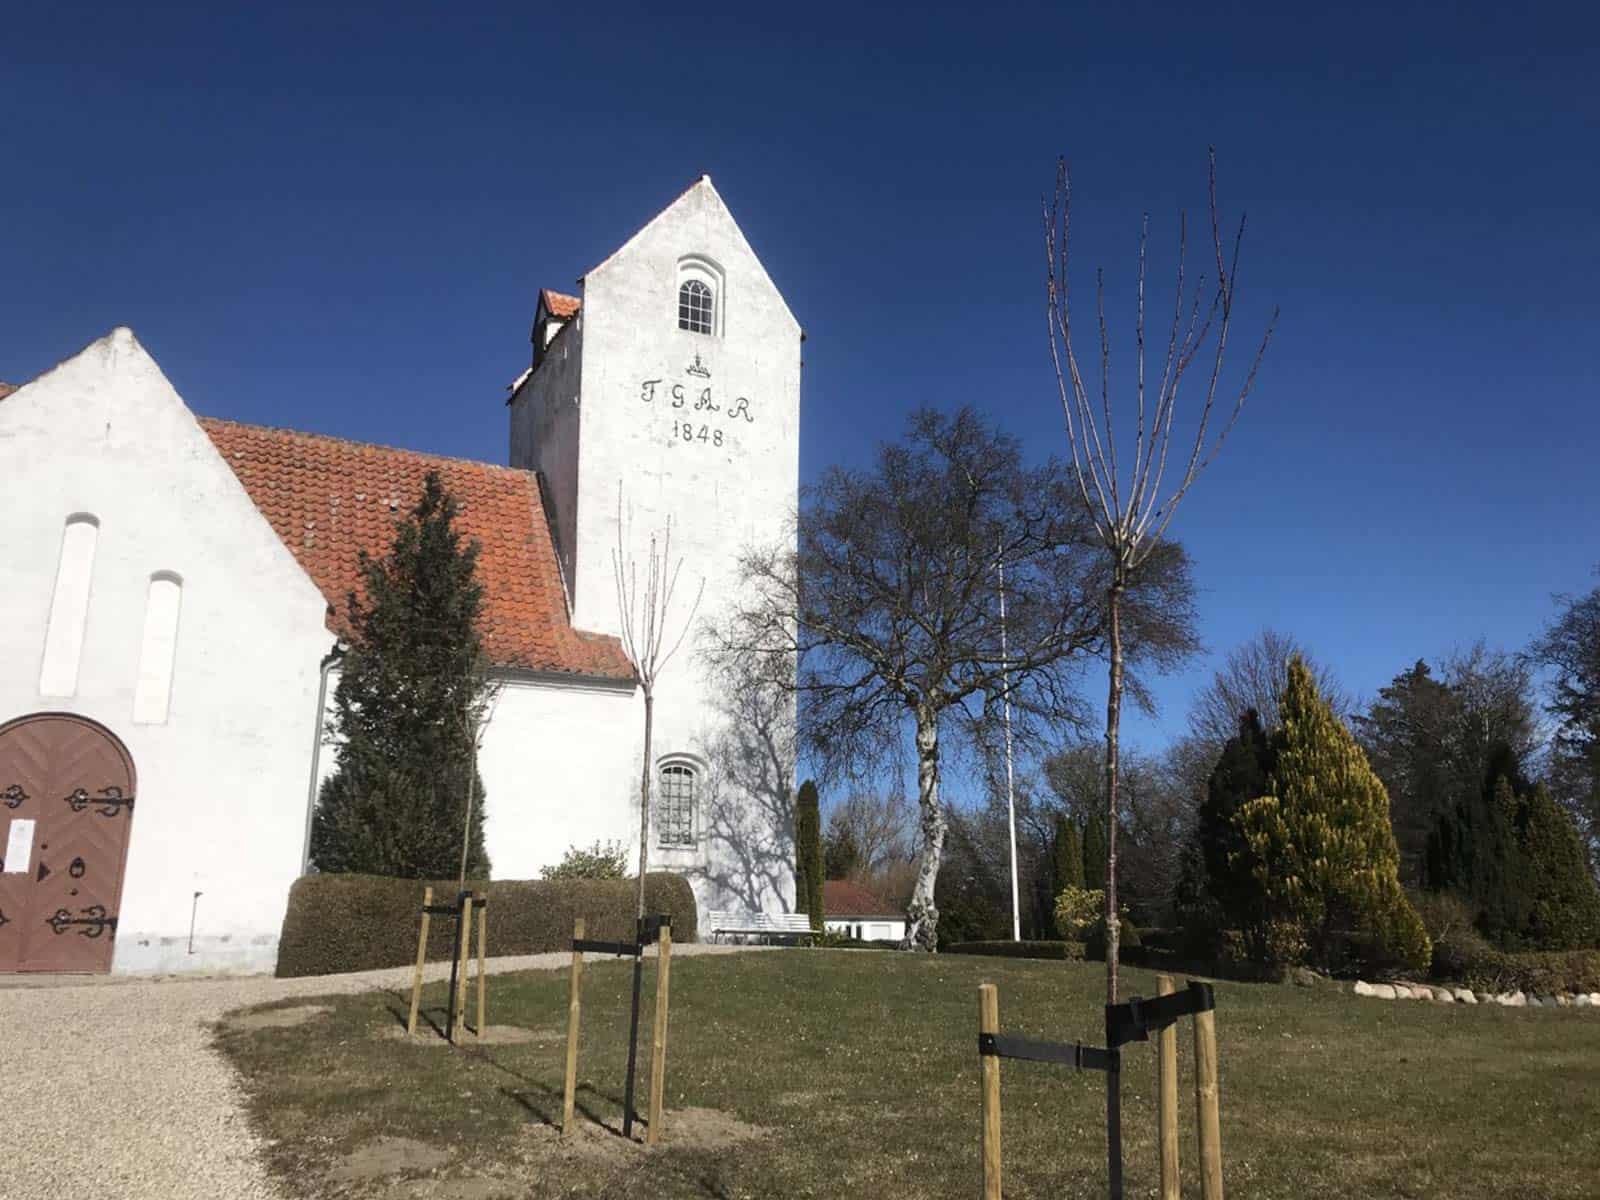 Stoense Kirke kirketårn